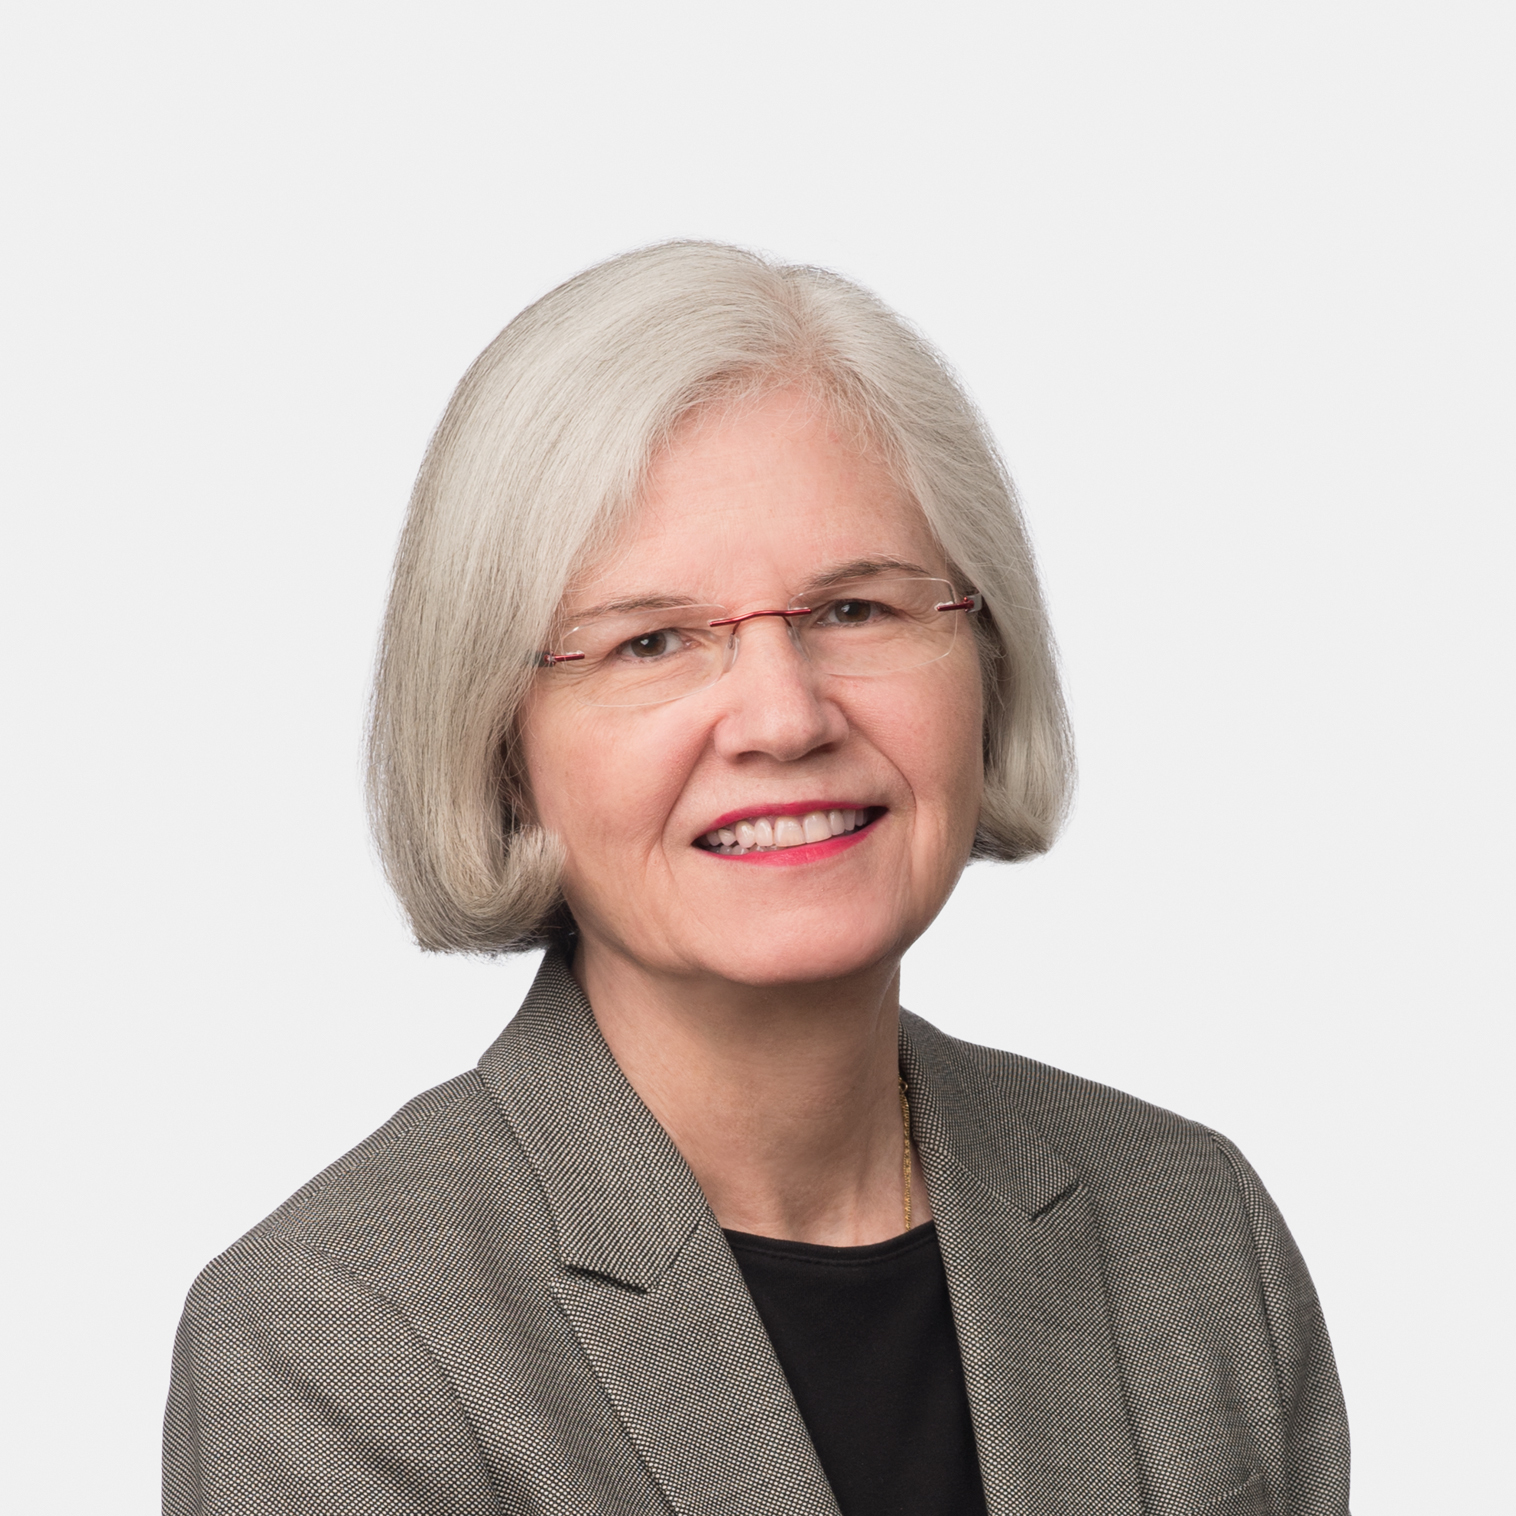 Silvia M. Alderman